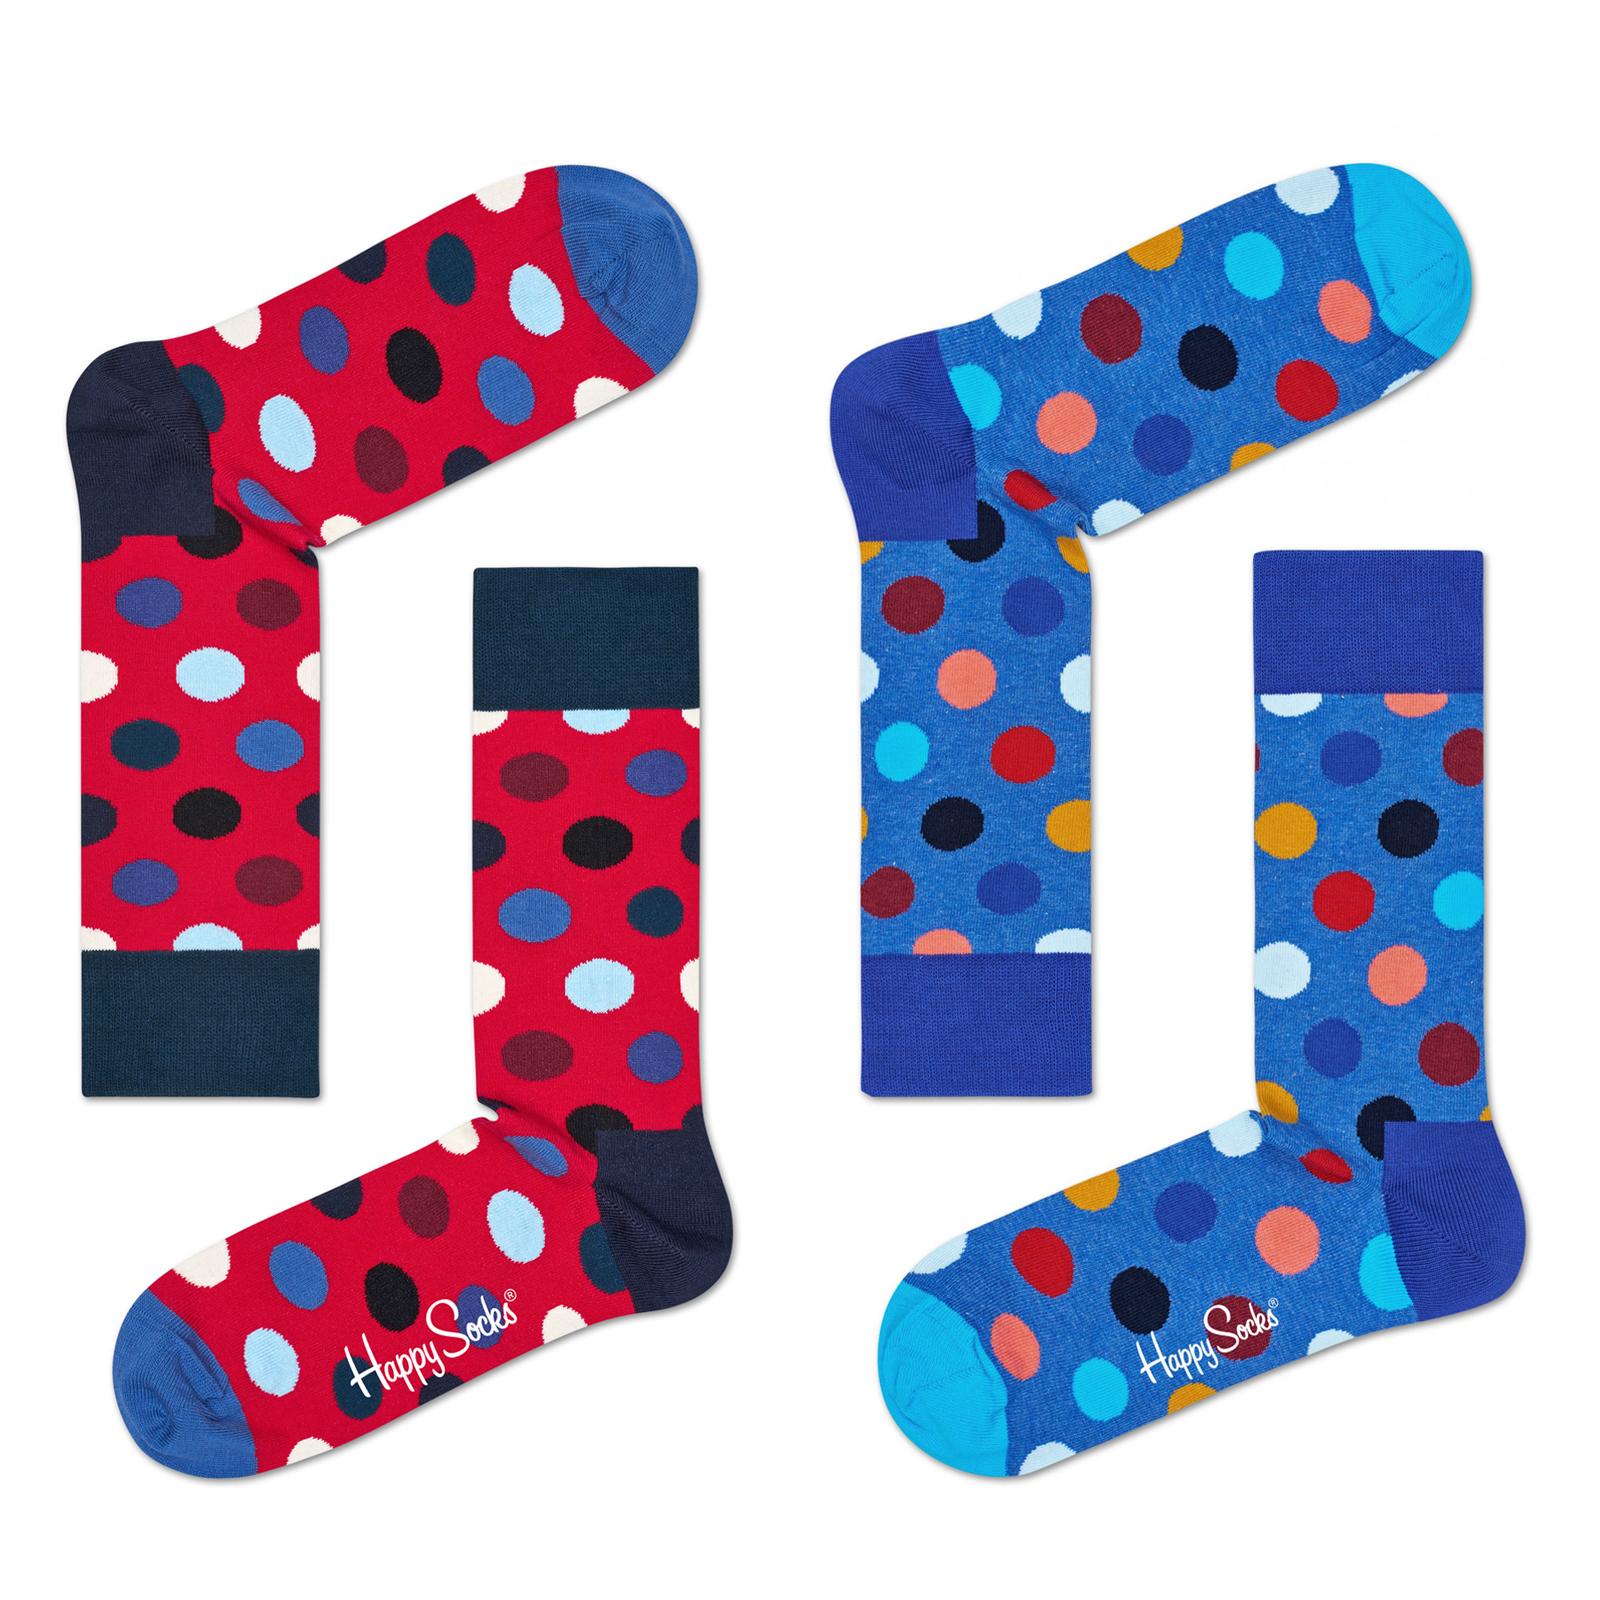 Happy Socks Unisex Socken Strümpfe Big Dot BDO01 36/40 41/46 in blau